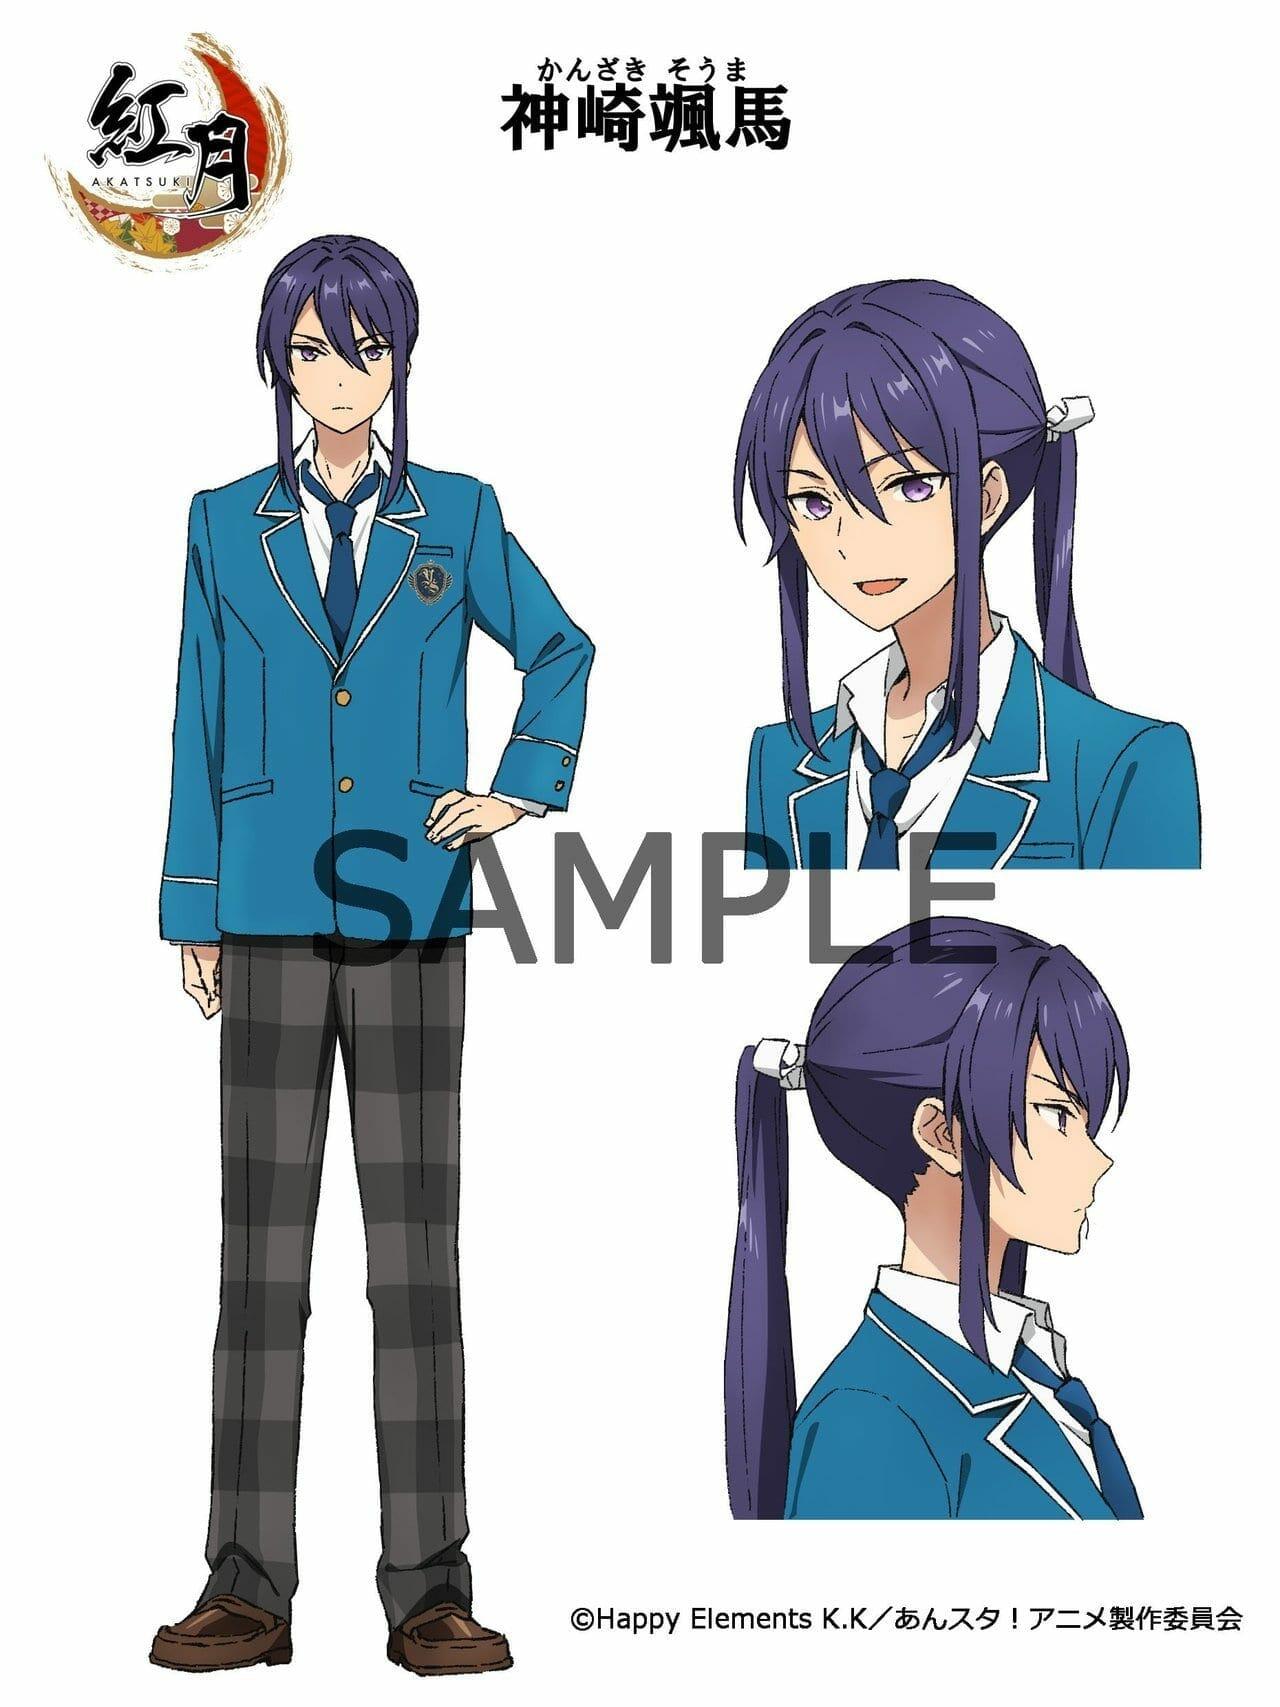 Akatsuki unit character design